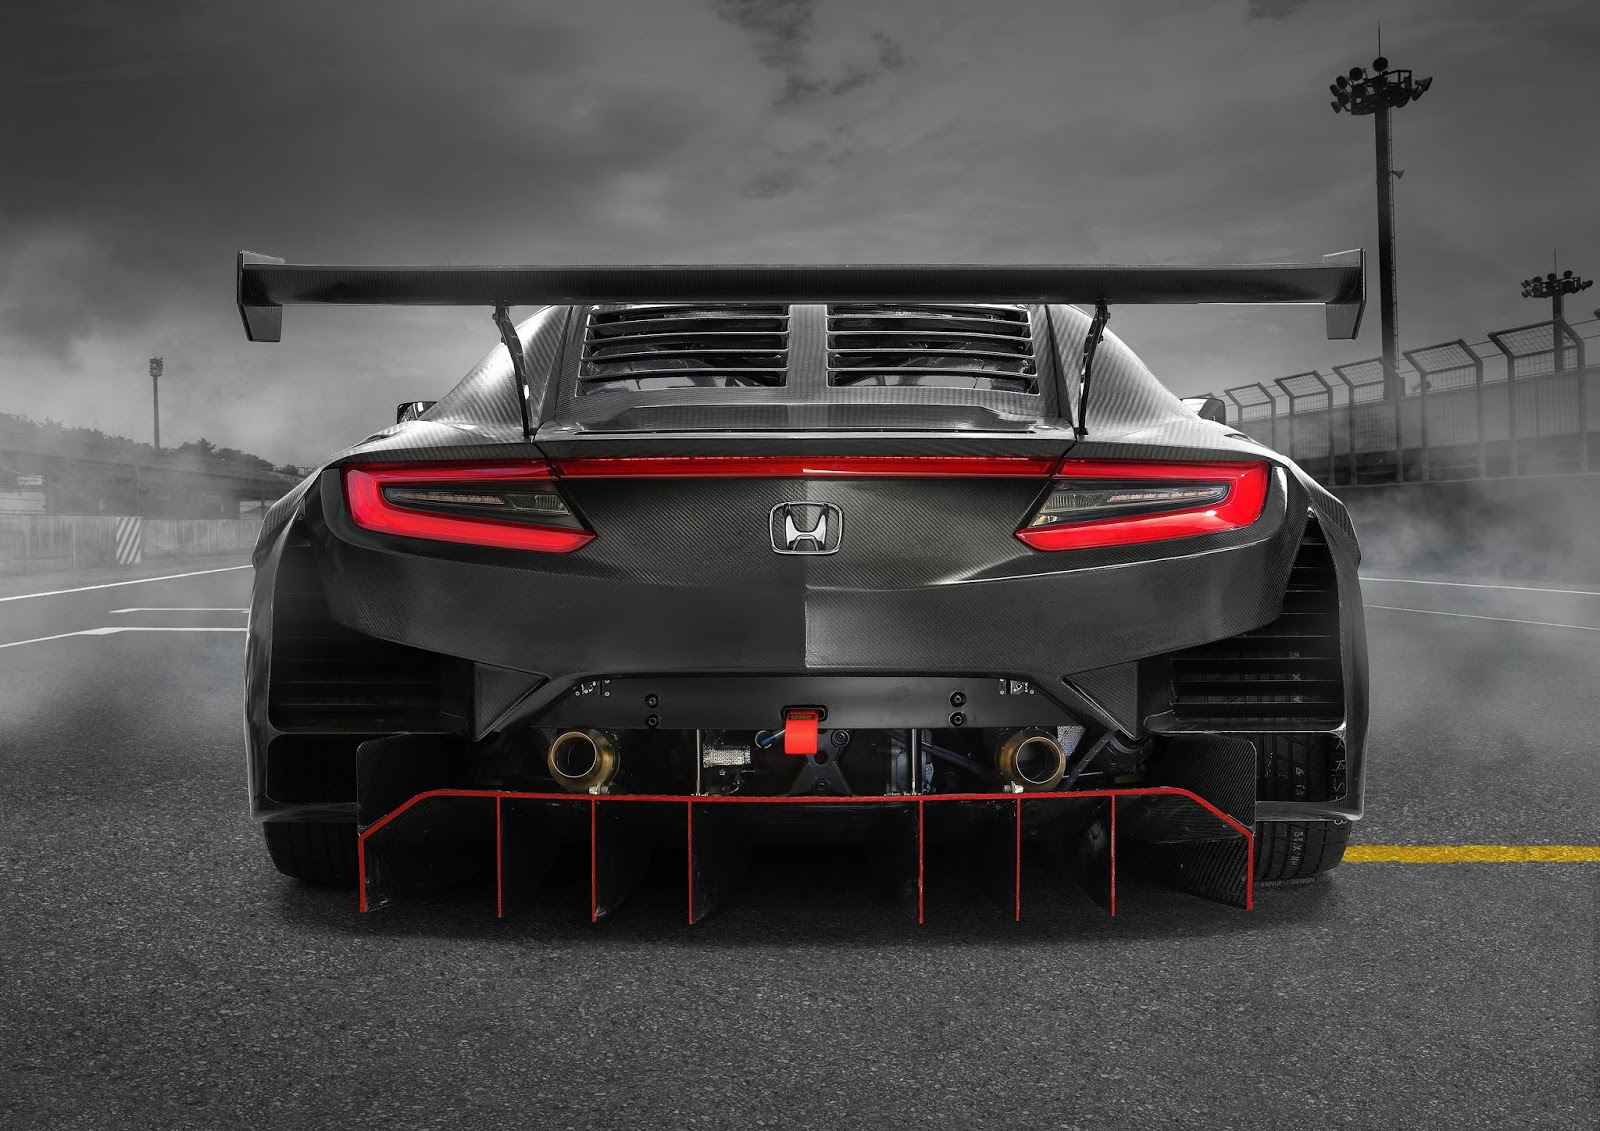 To NSX GT3 Evo θα αγωνιστεί σε παγκόσμιο επίπεδο το 2019